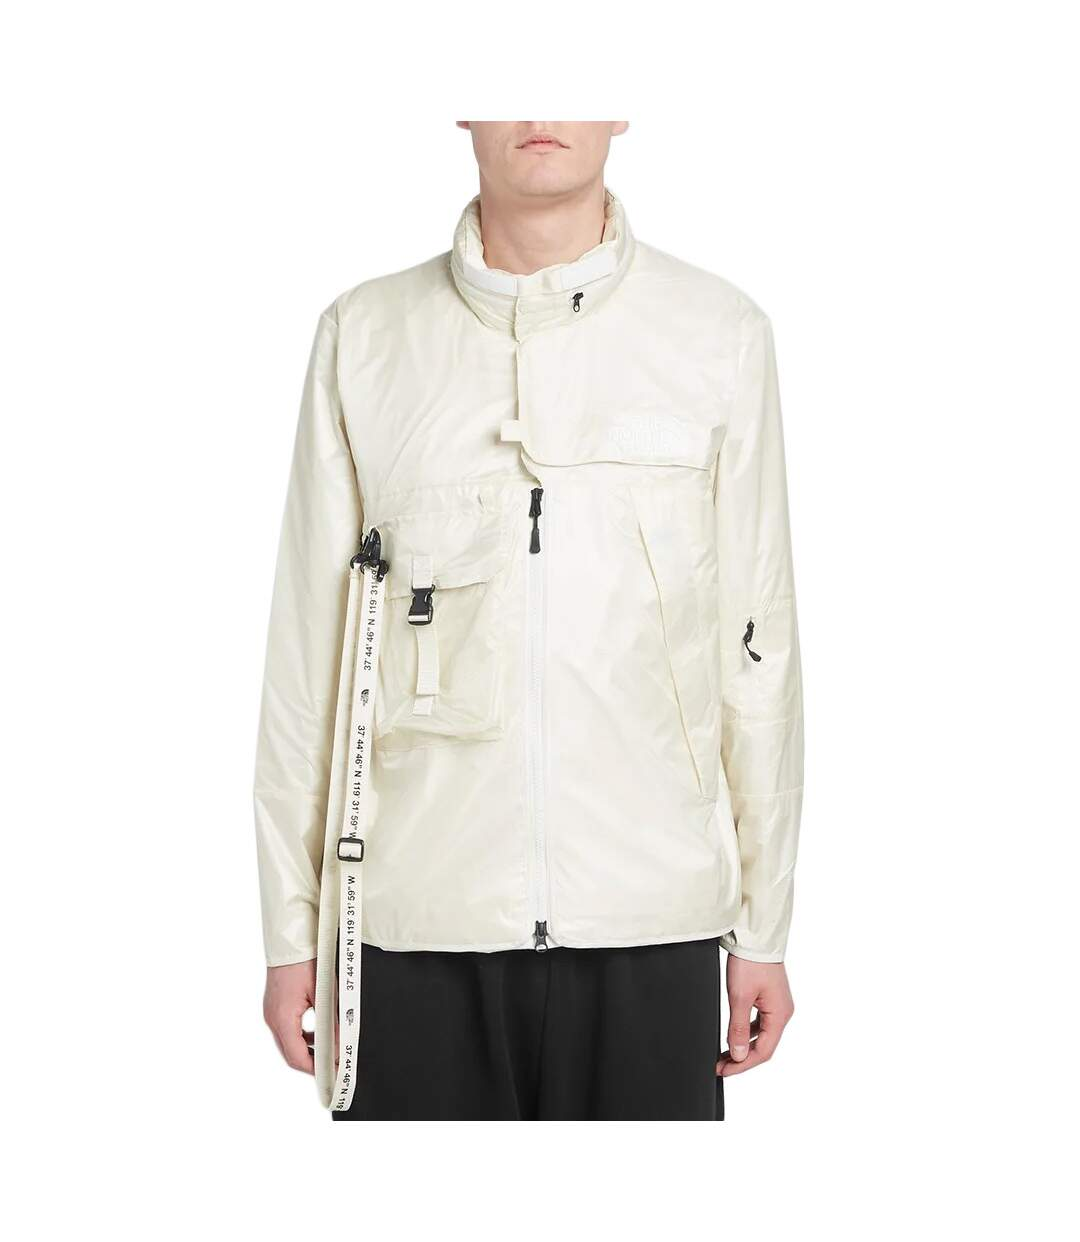 Veste bomber beige homme The North Face KK Bomber Jacket